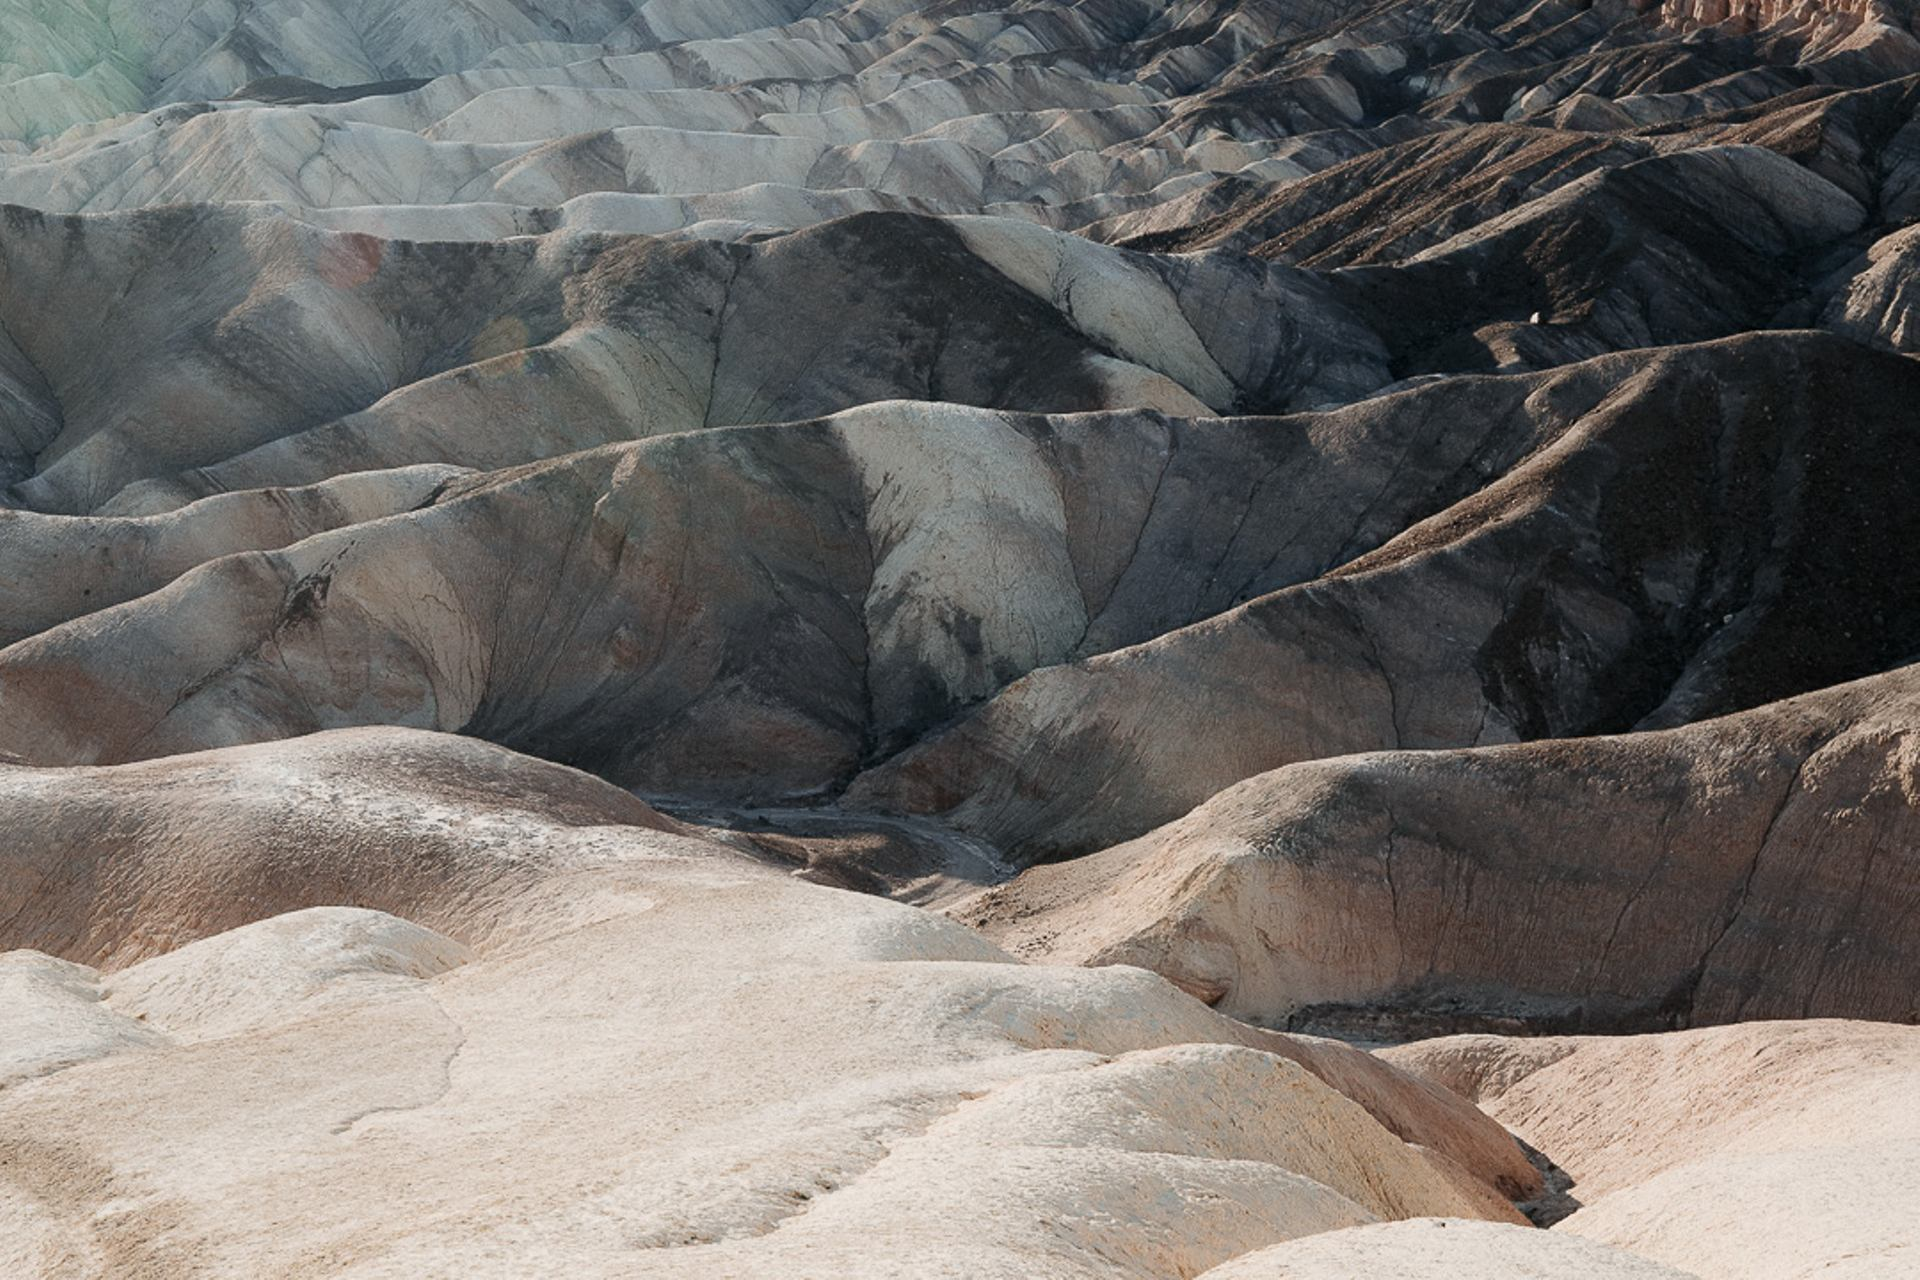 40C° à Death Valley